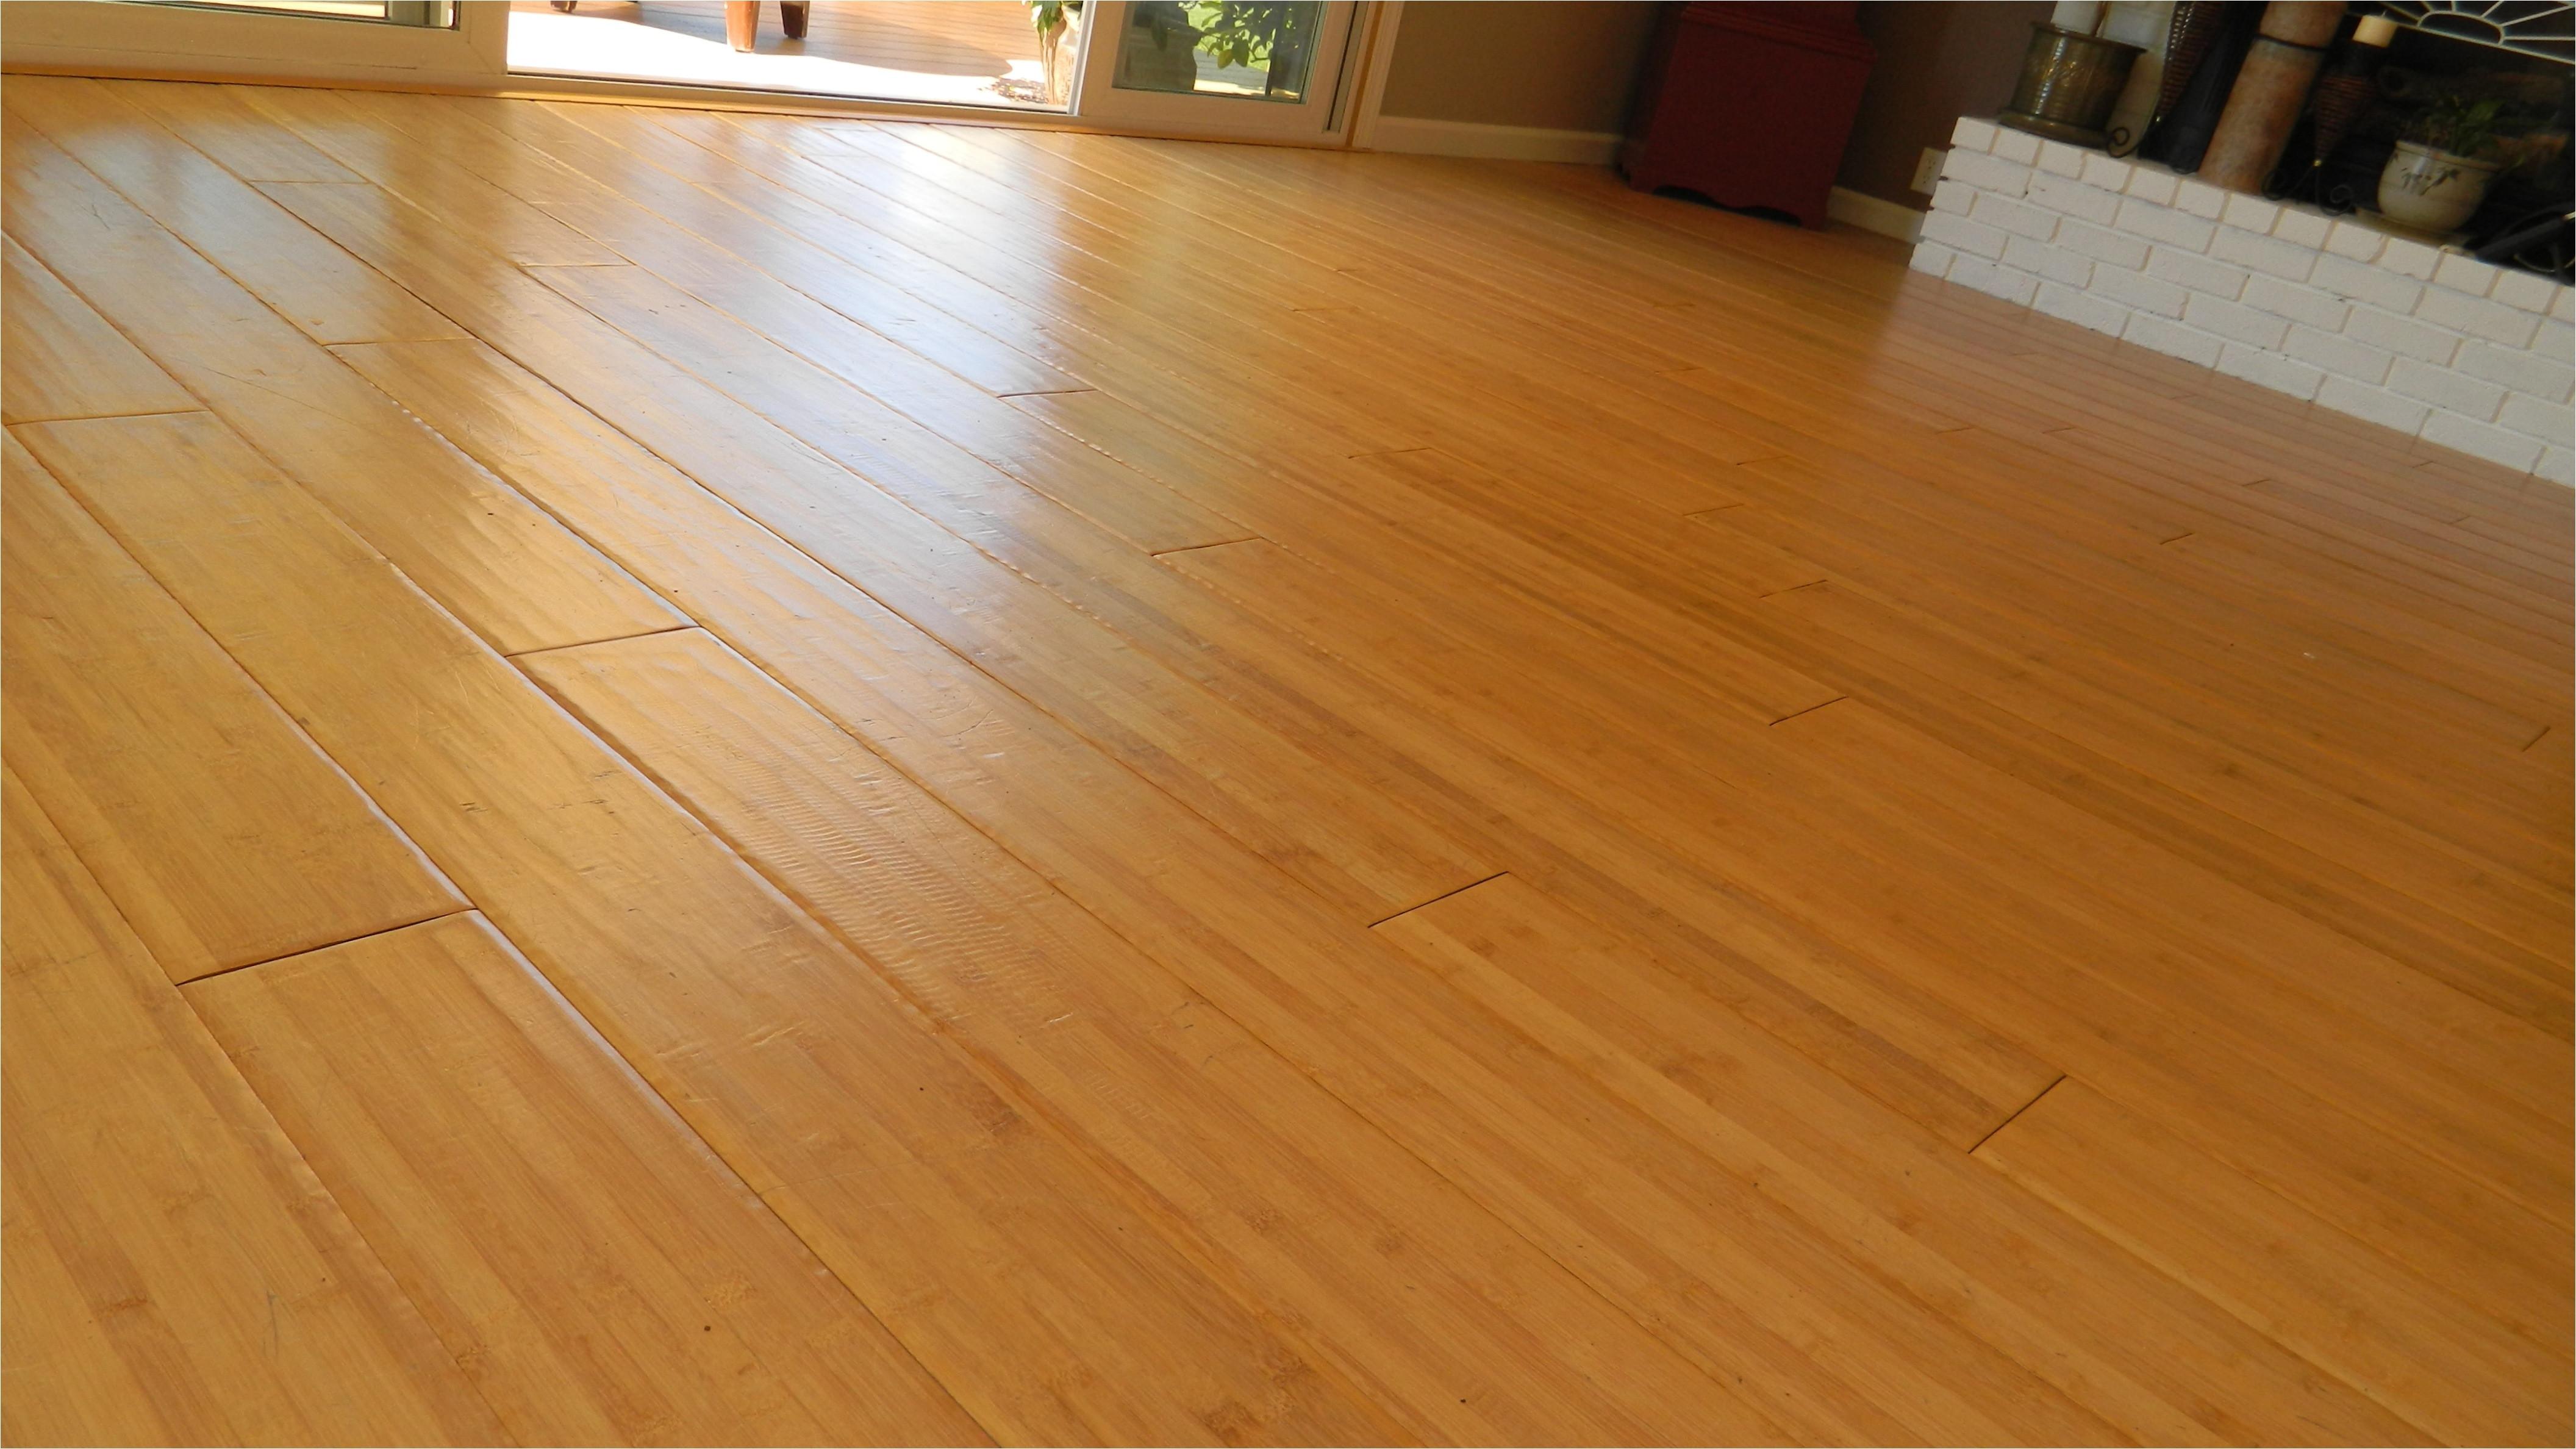 strand bamboo flooring vs hardwood of 37 best unfinished bamboo floor stock flooring design ideas throughout unfinished bamboo floor beautiful shark steam mop engineered hardwood floors pics of 37 best unfinished bamboo